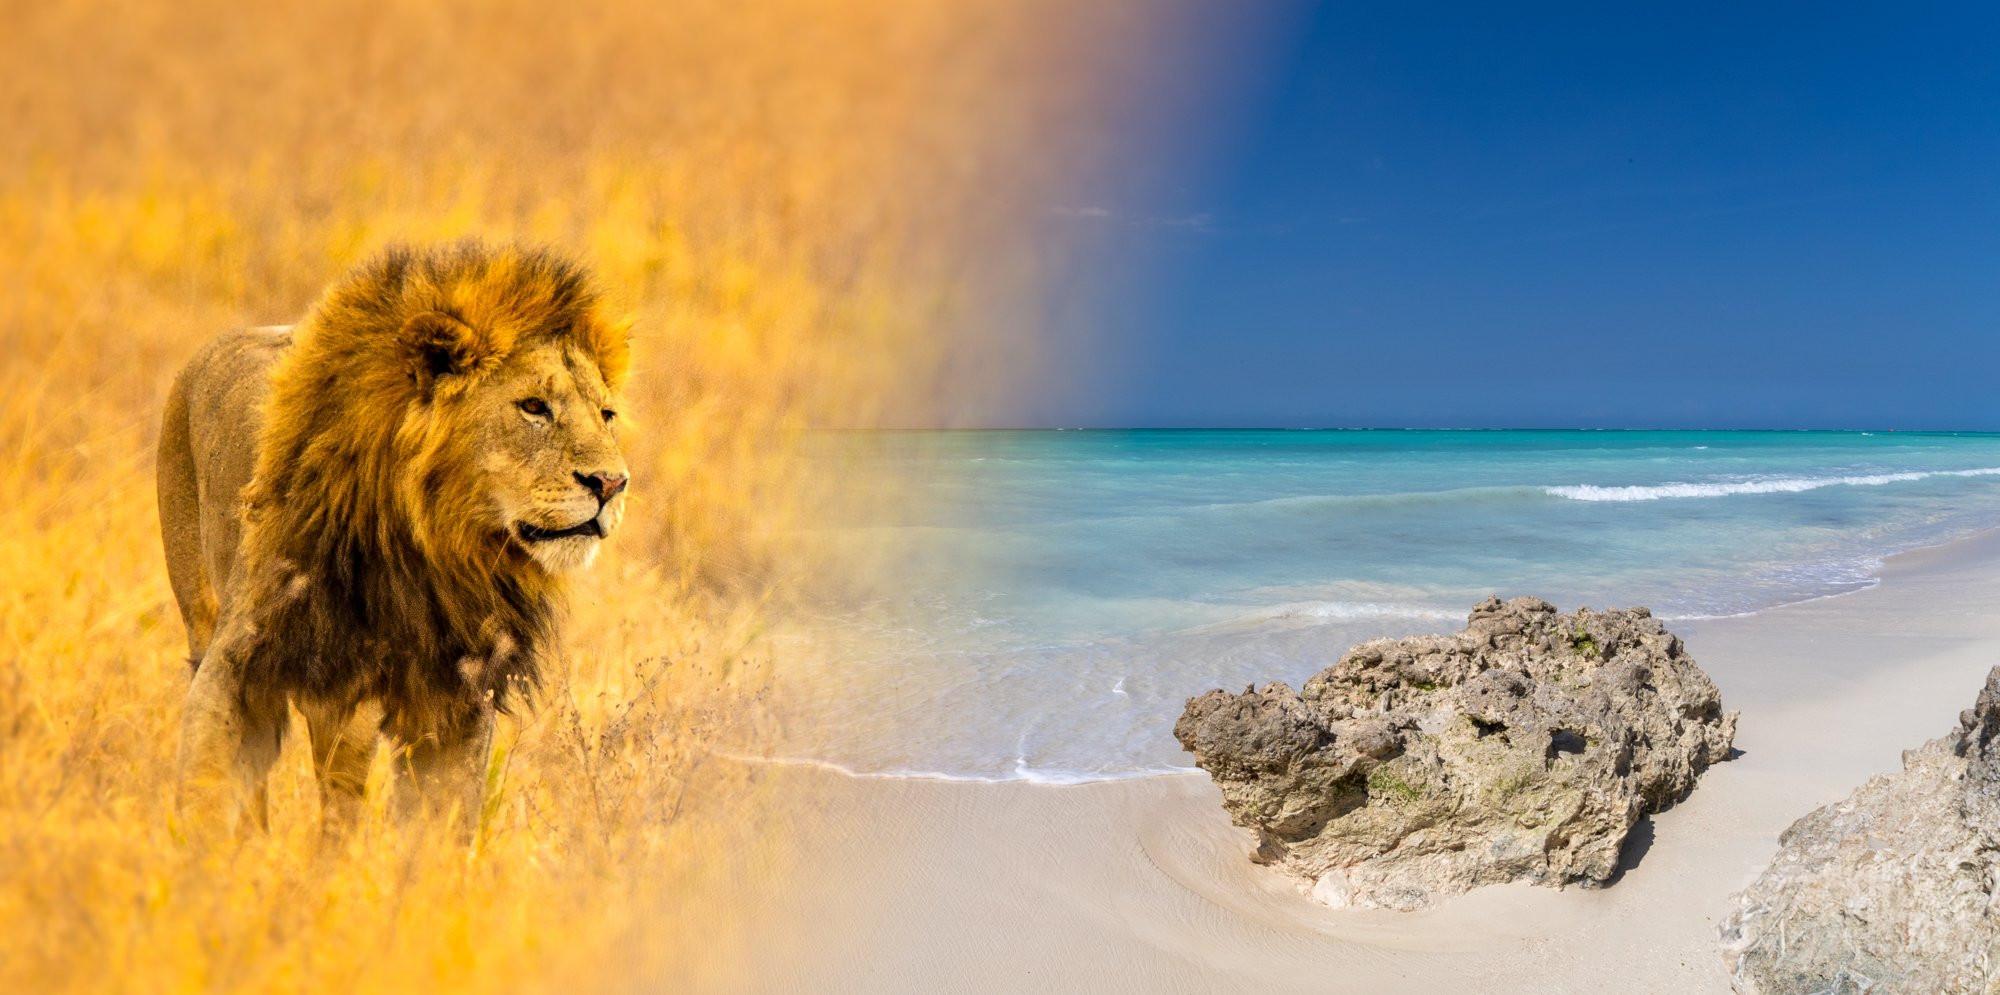 Ras Nungwi beach, and Lion collage, Tanzania